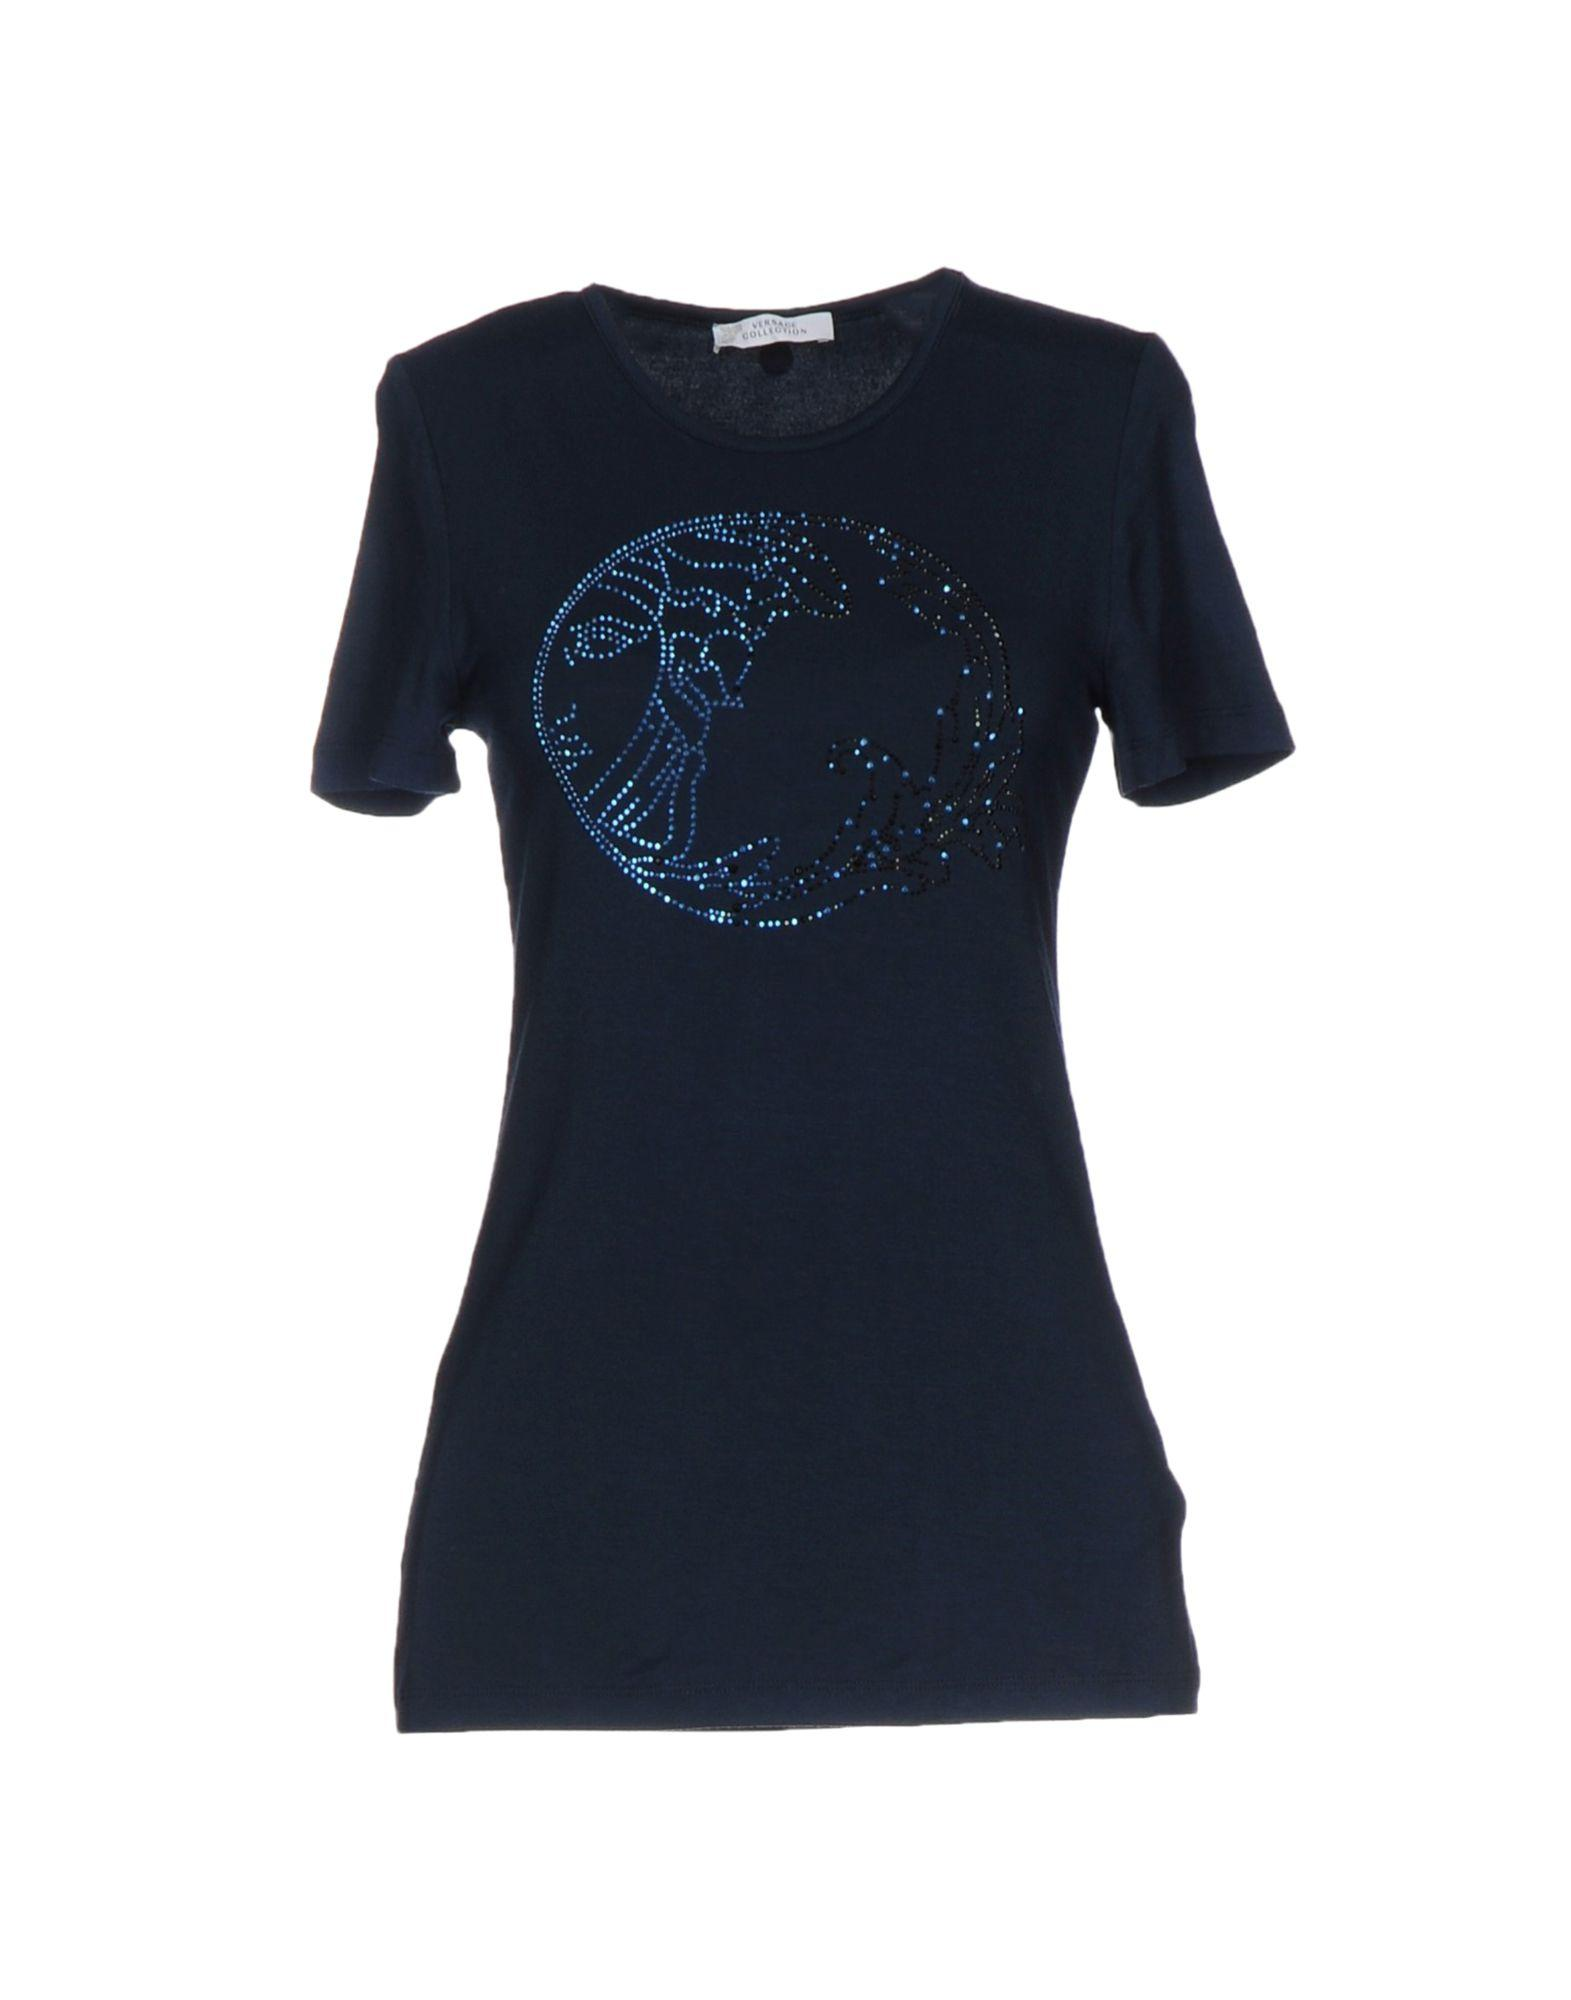 Lyst versace t shirt in blue for Versace t shirts women